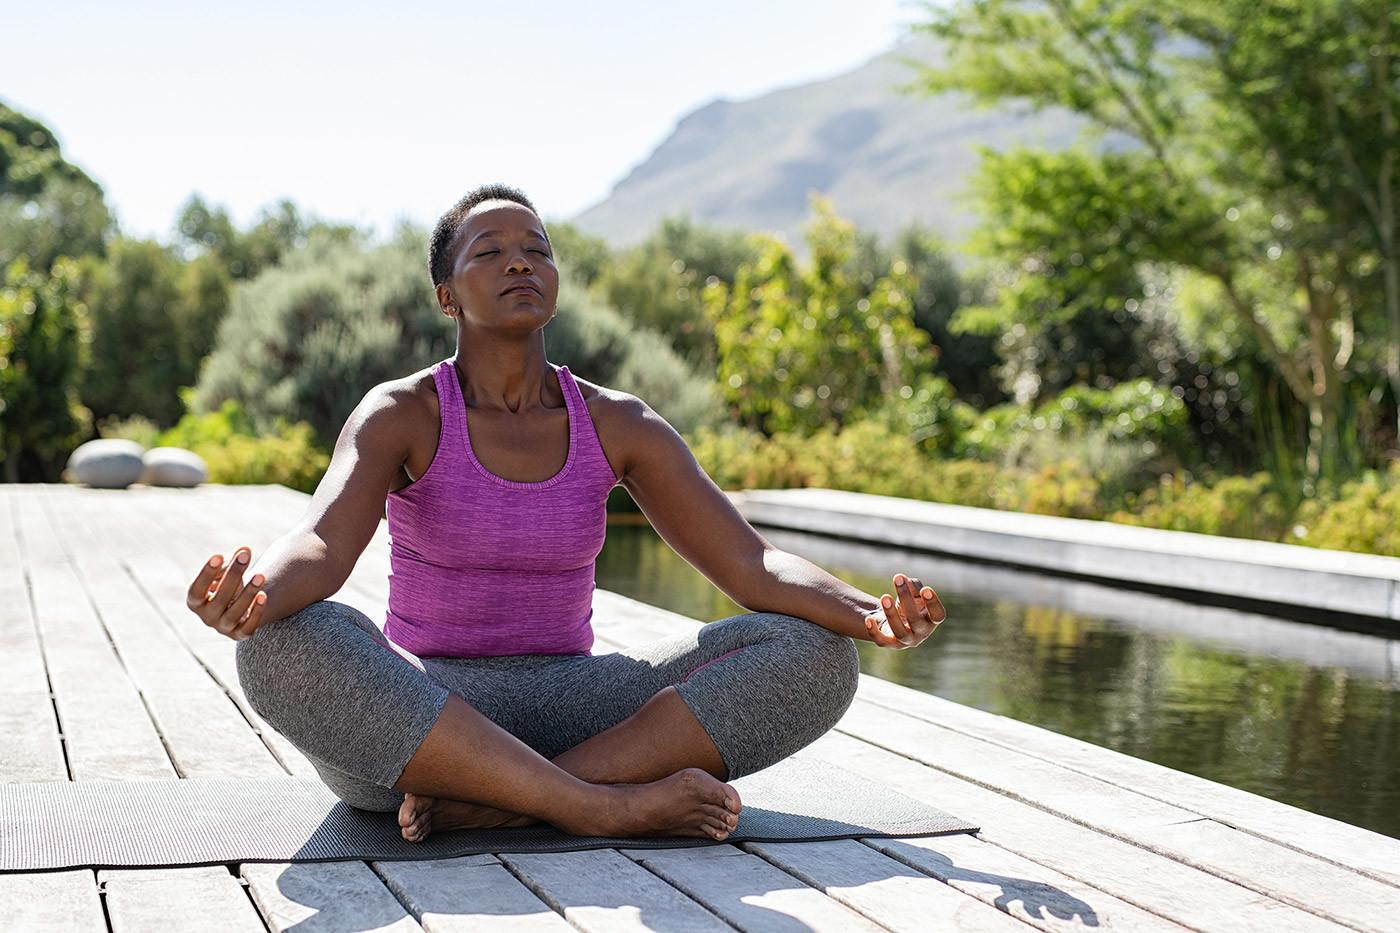 woman meditating outdoors